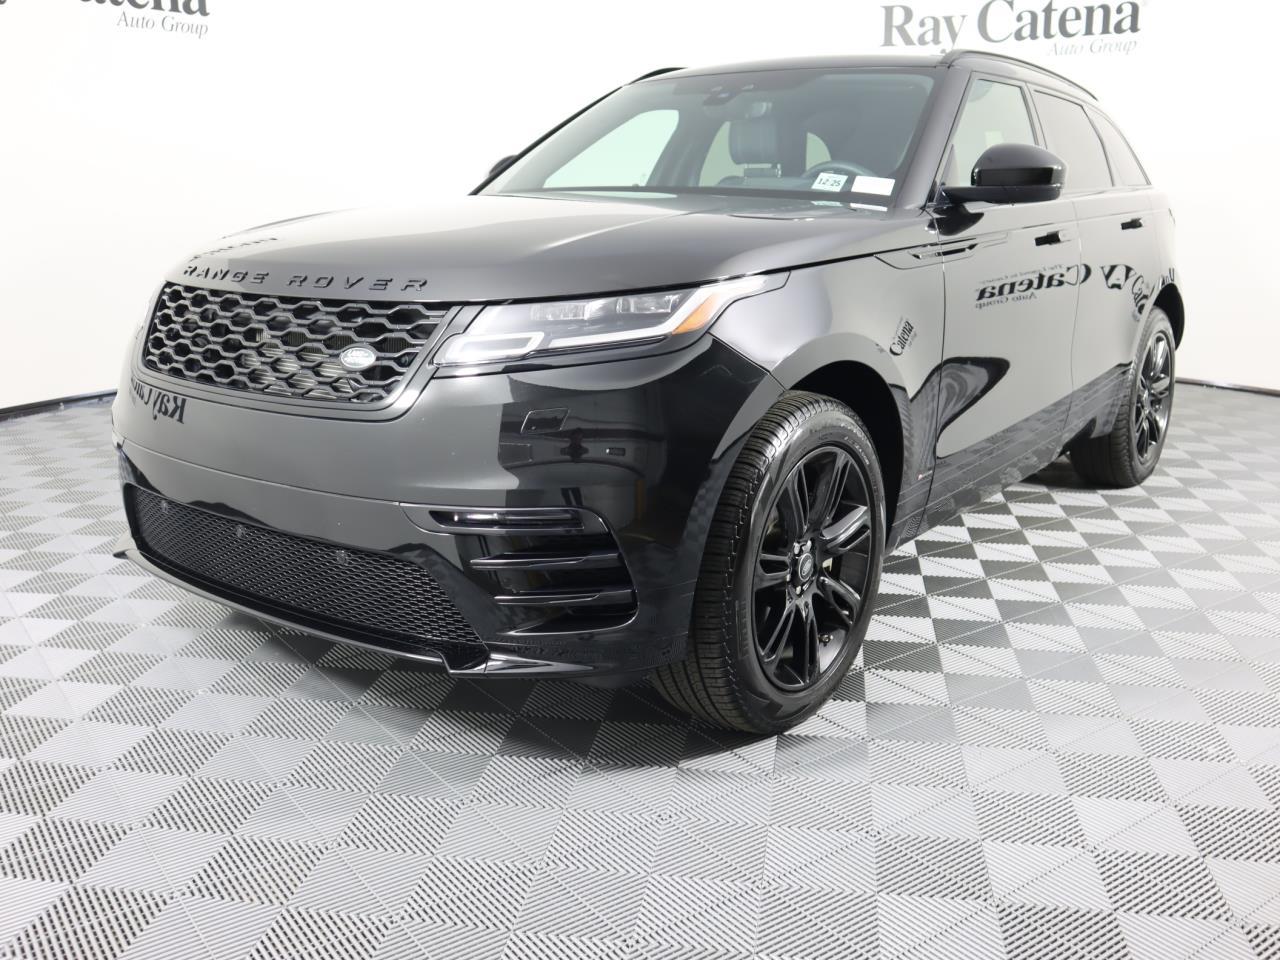 Certified Pre-Owned 2020 Land Rover Range Rover Velar P340 R-Dynamic S